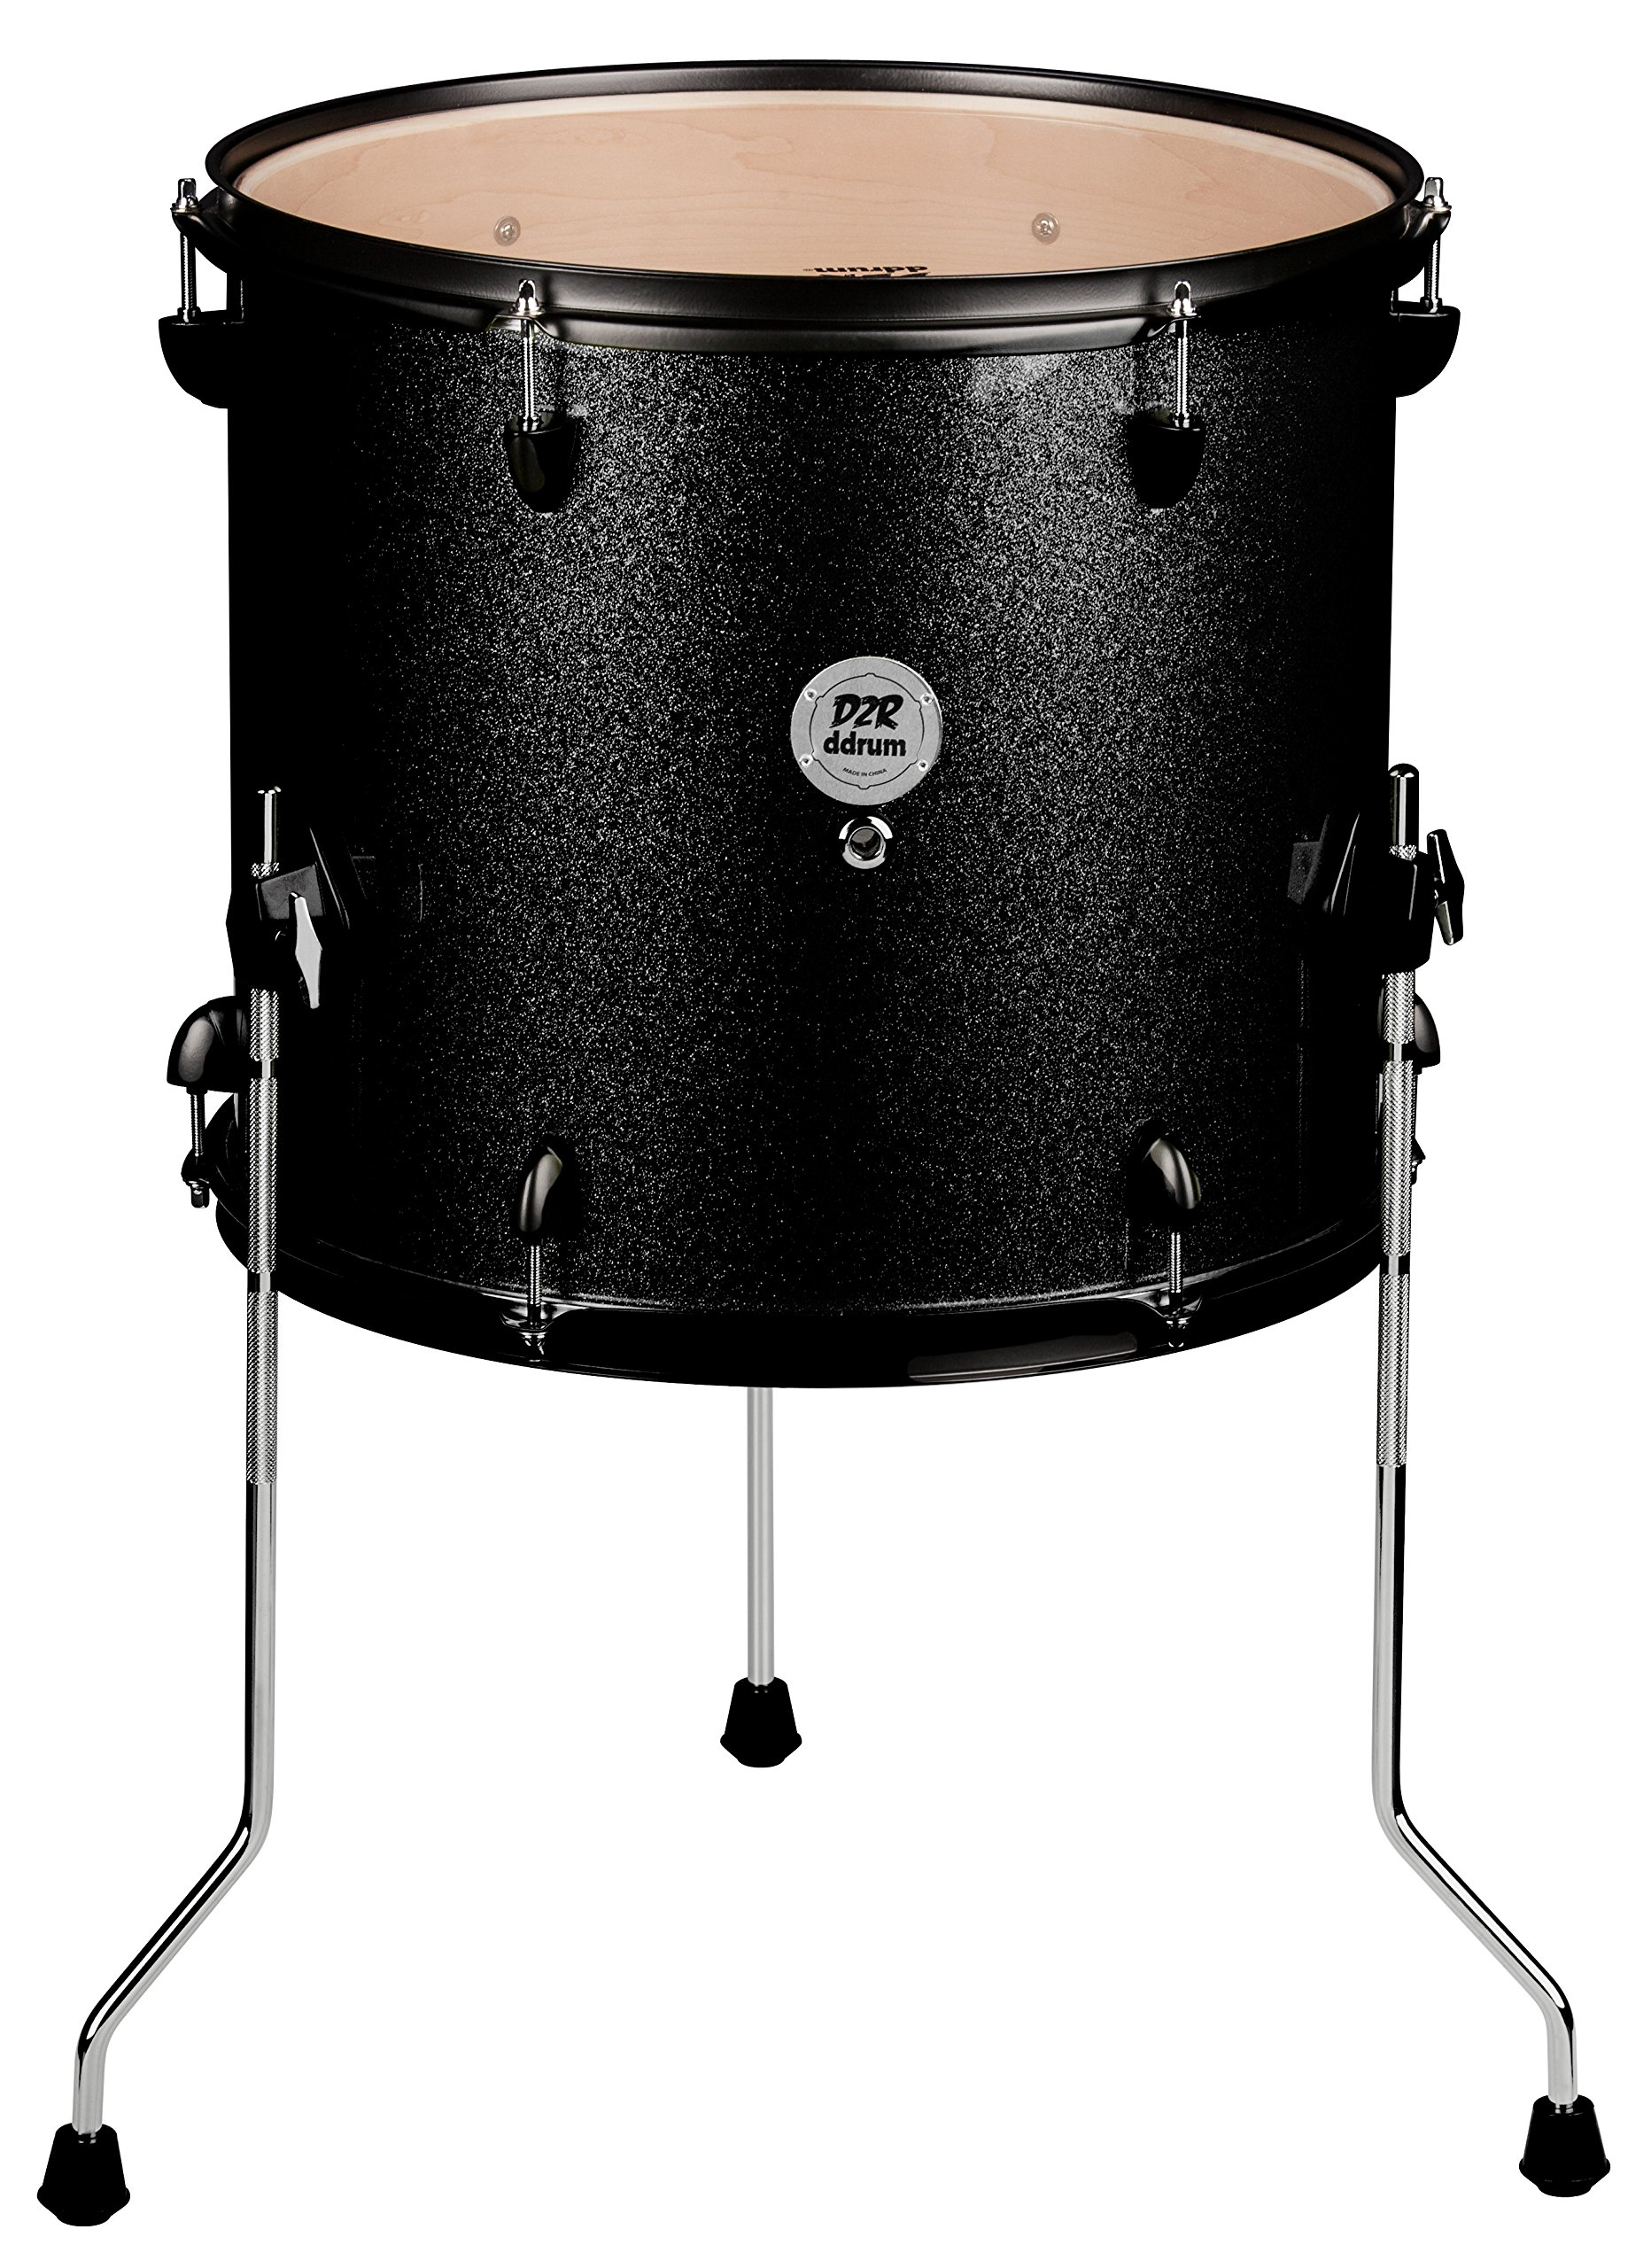 ddrum D2R FT 12X14 BLK SPKL Series Sparkle Floor Tom Drum Set, Black by Ddrum